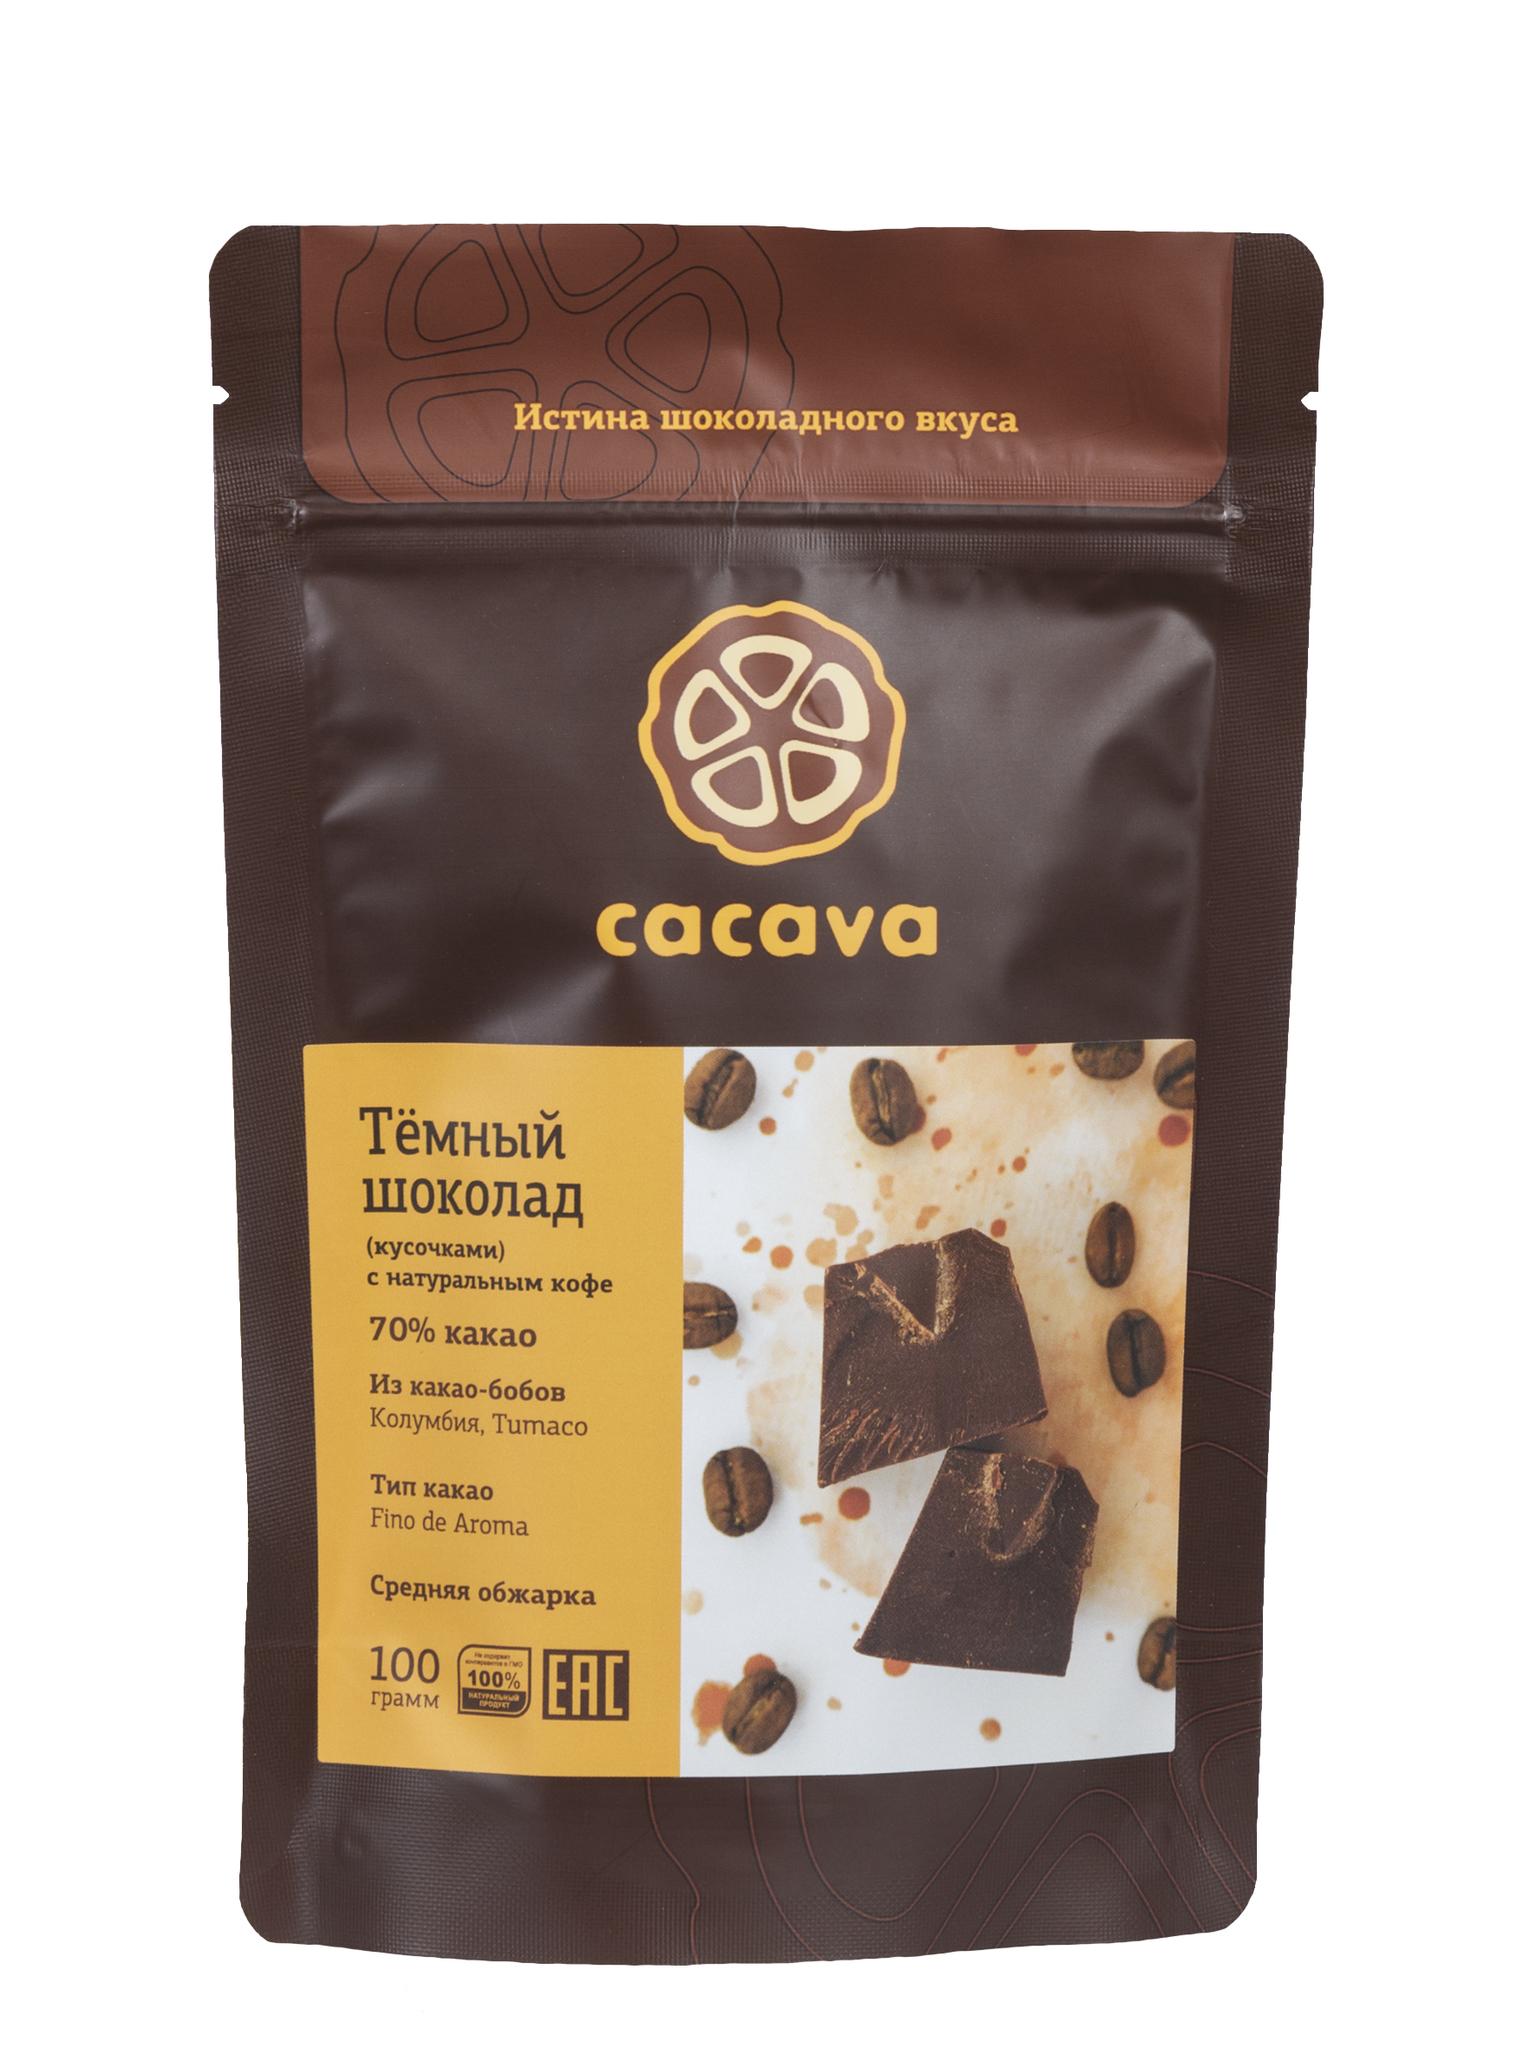 Тёмный шоколад с кофе 70 % какао (Колумбия, Tumaco), упаковка 100 грамм